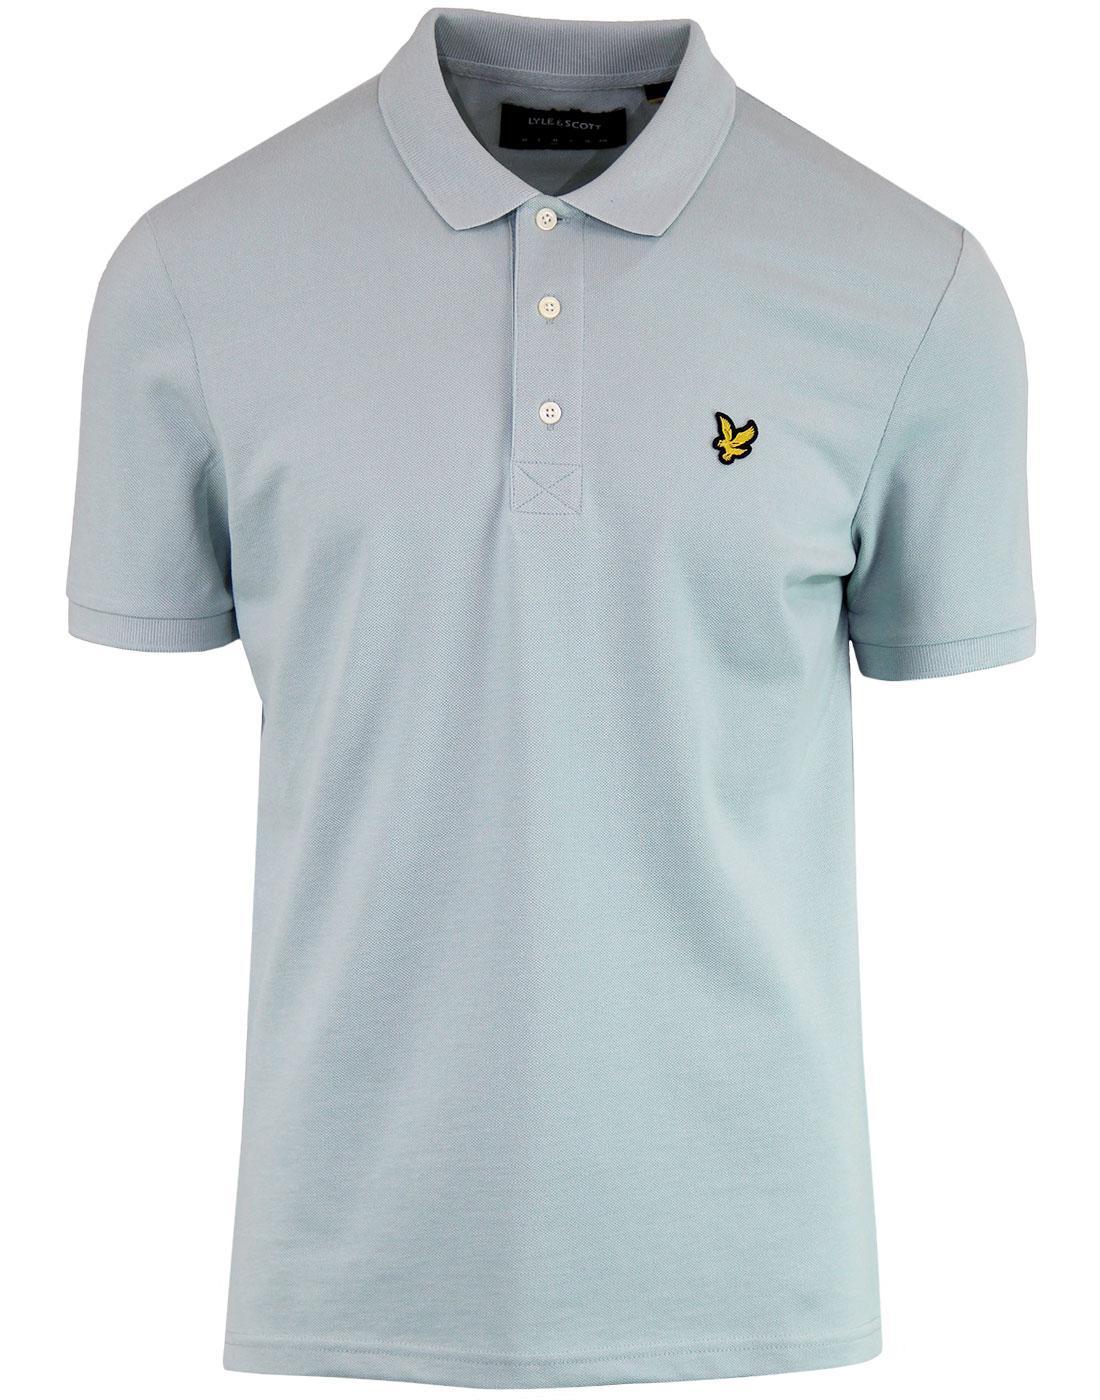 LYLE & SCOTT Classic Mod Pique Polo Shirt (Powder)